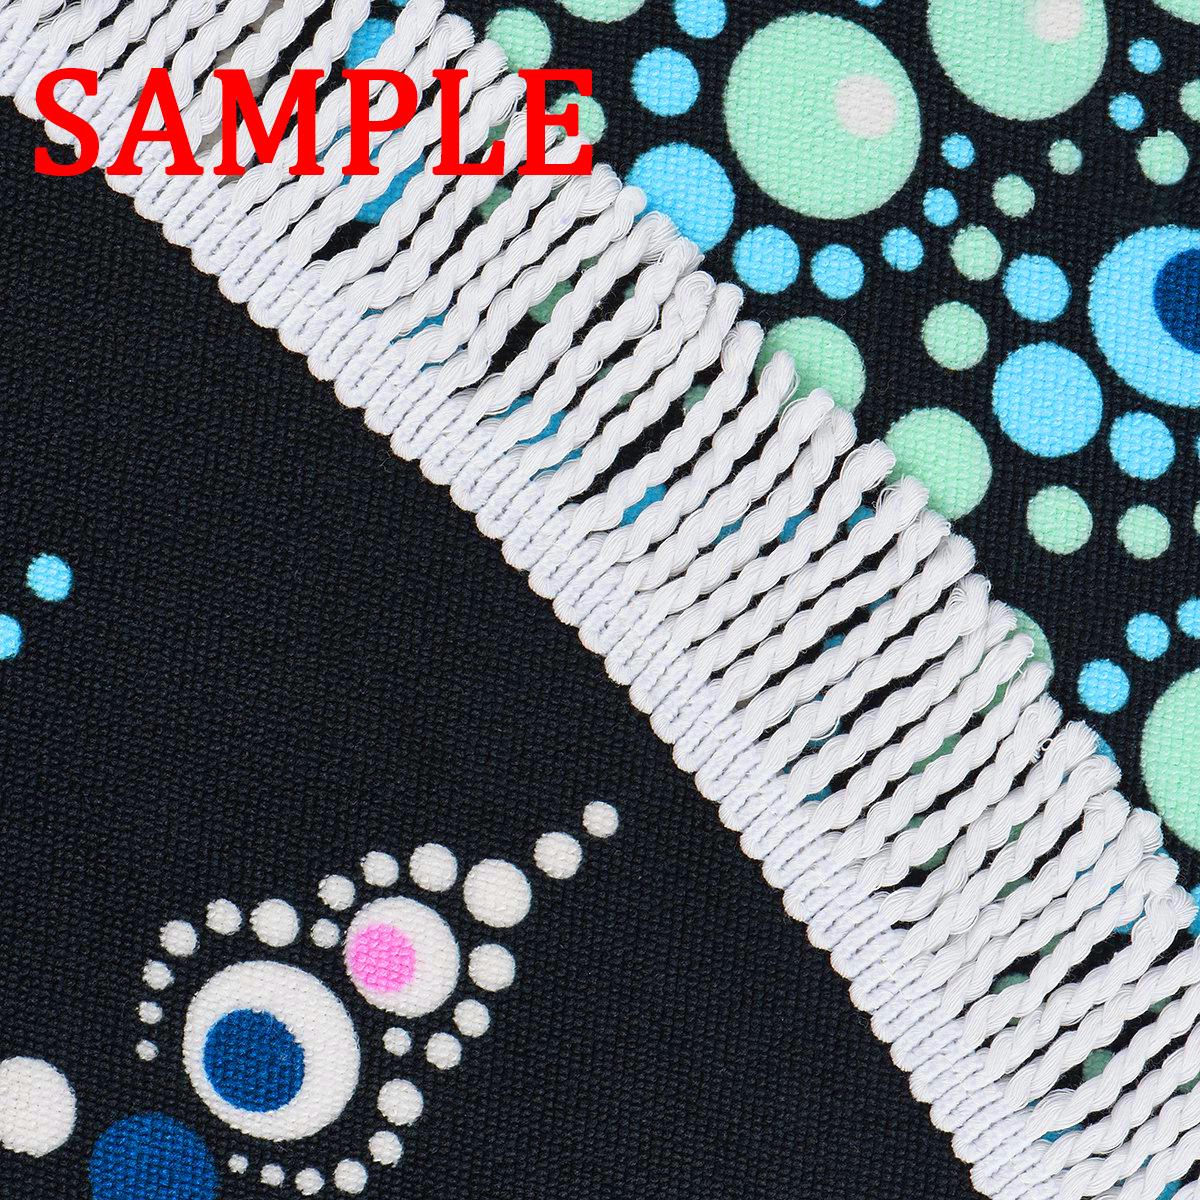 GCKG Octopus Beach Towel,Blue Octopus Round Beach Blanket with Tassels Yoga Mat Picnic Blanket - image 1 of 3